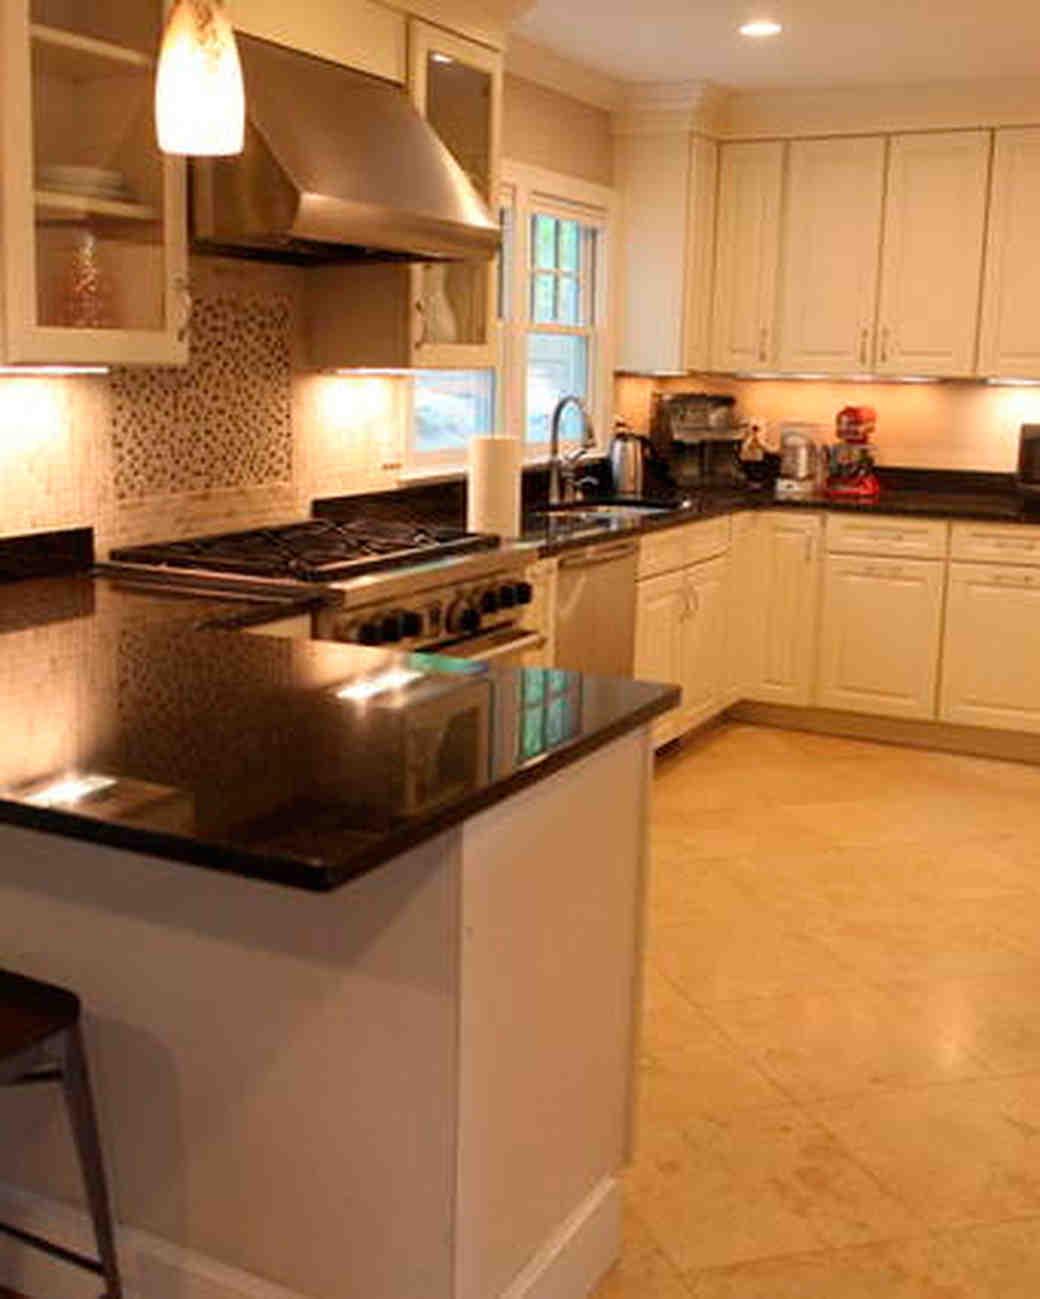 bachelorette-party-destinations-boston-massachusetts-airbnb-1215.jpg